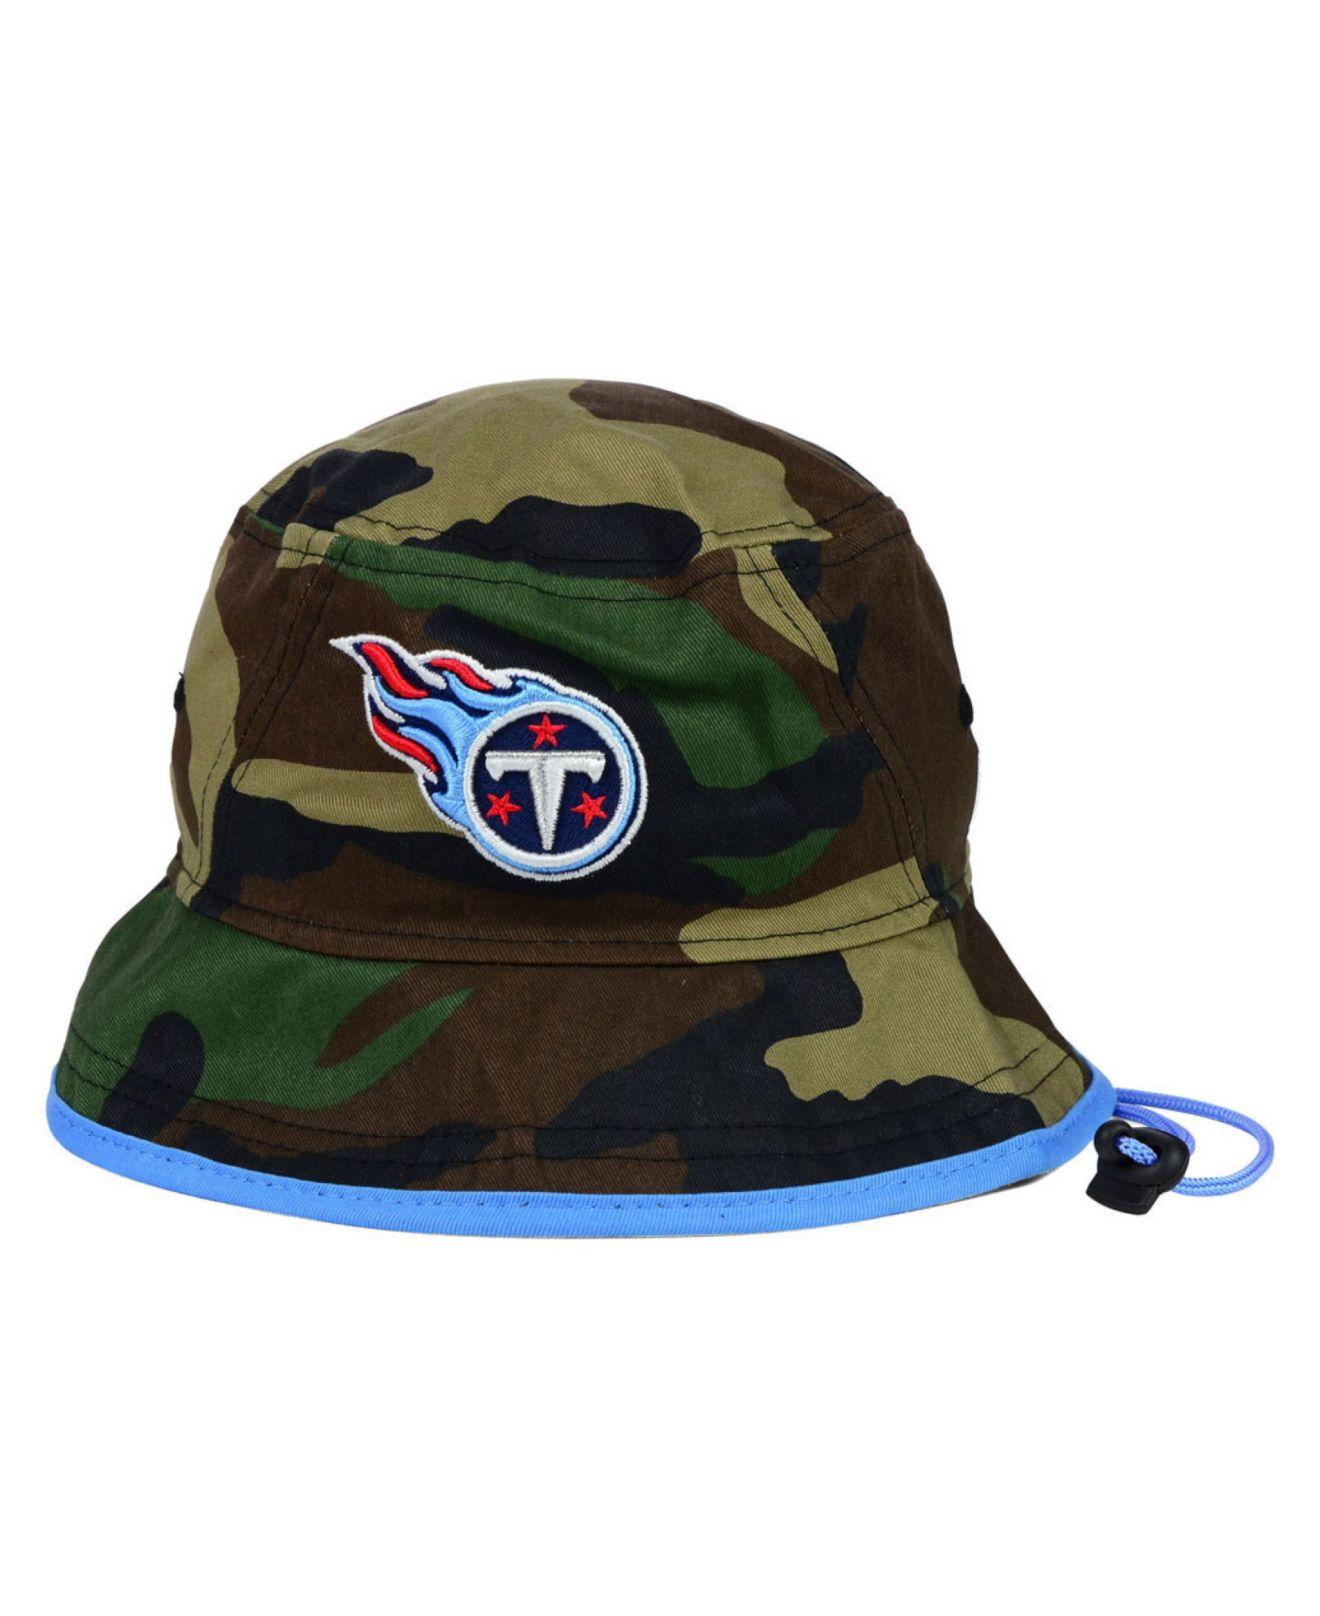 40153de9413 ... nfl heather gray bucket hat in gray 52e30 85125  cheap lyst ktz  tennessee titans camo pop bucket hat in green for men 3d4fb 517b8